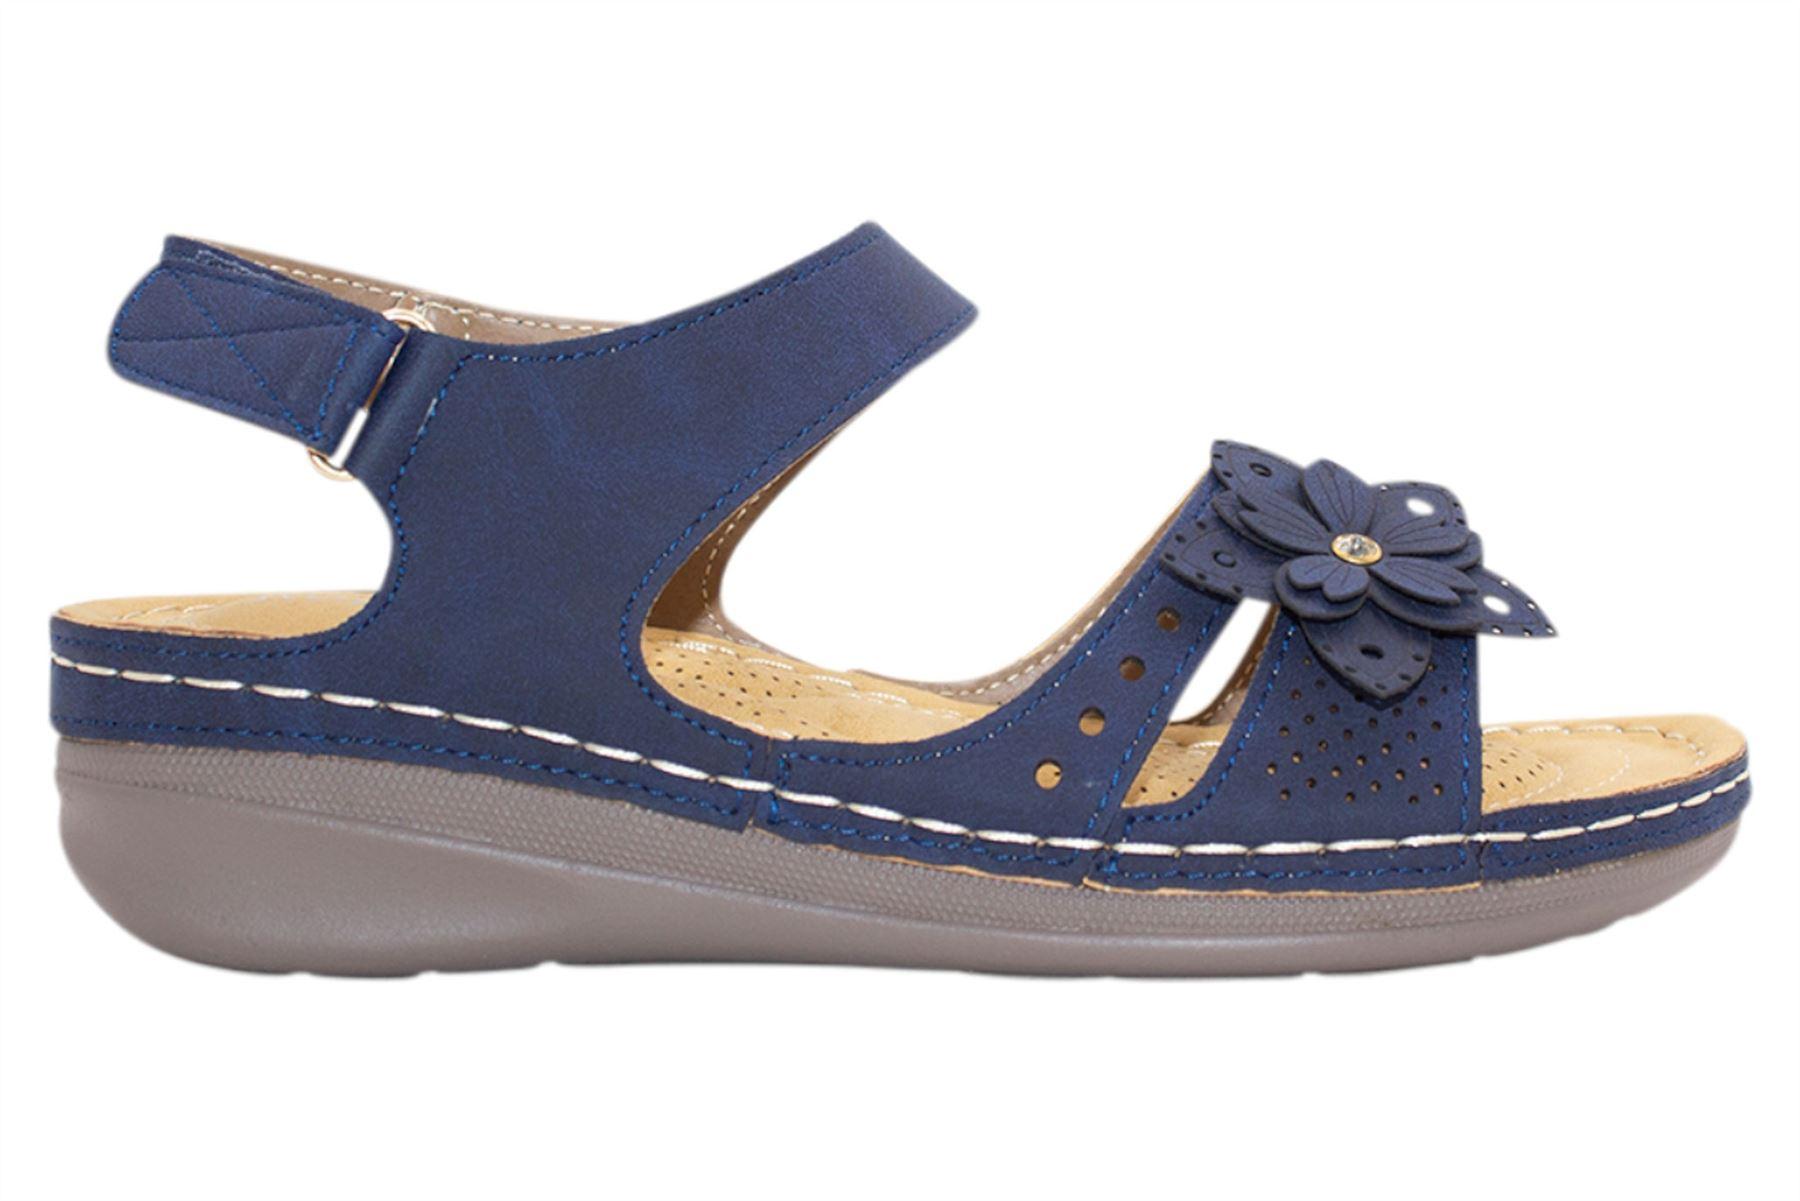 Ladies-Wedge-Heel-Sandal-Womens-Comfort-Cushion-Strapy-Summer-Shoes miniatura 38